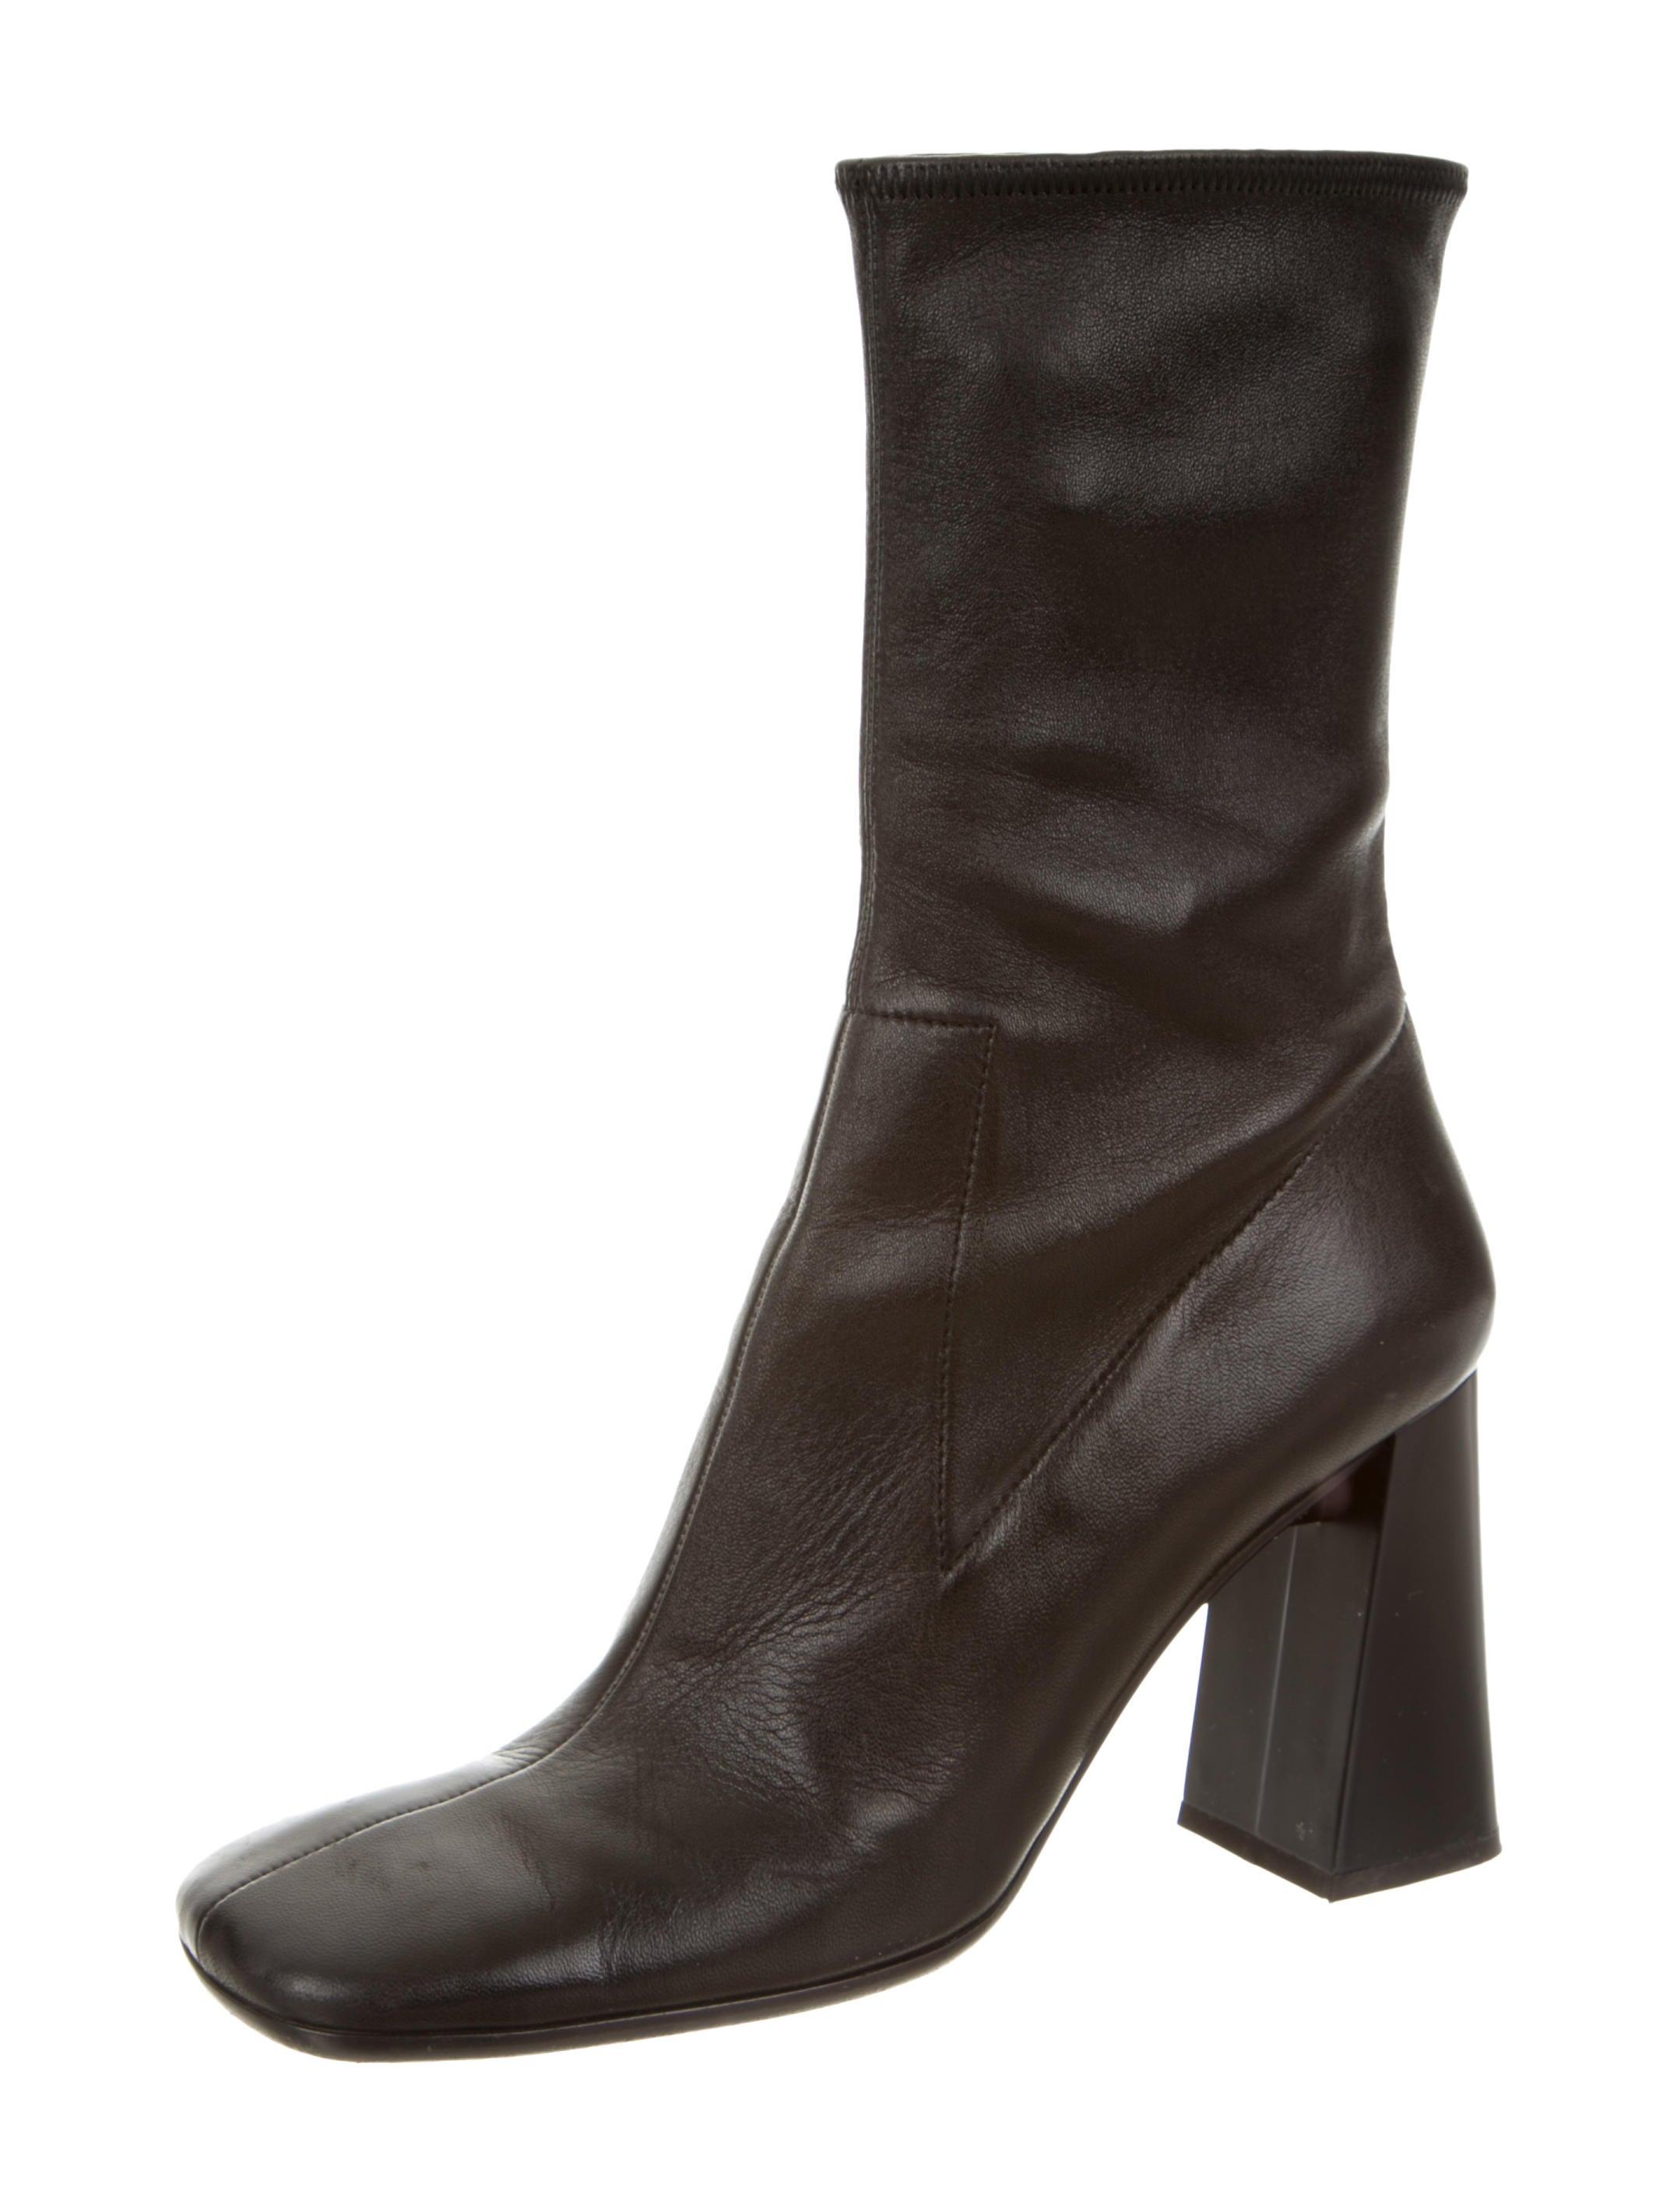 prada leather square toe ankle boots shoes pra92397